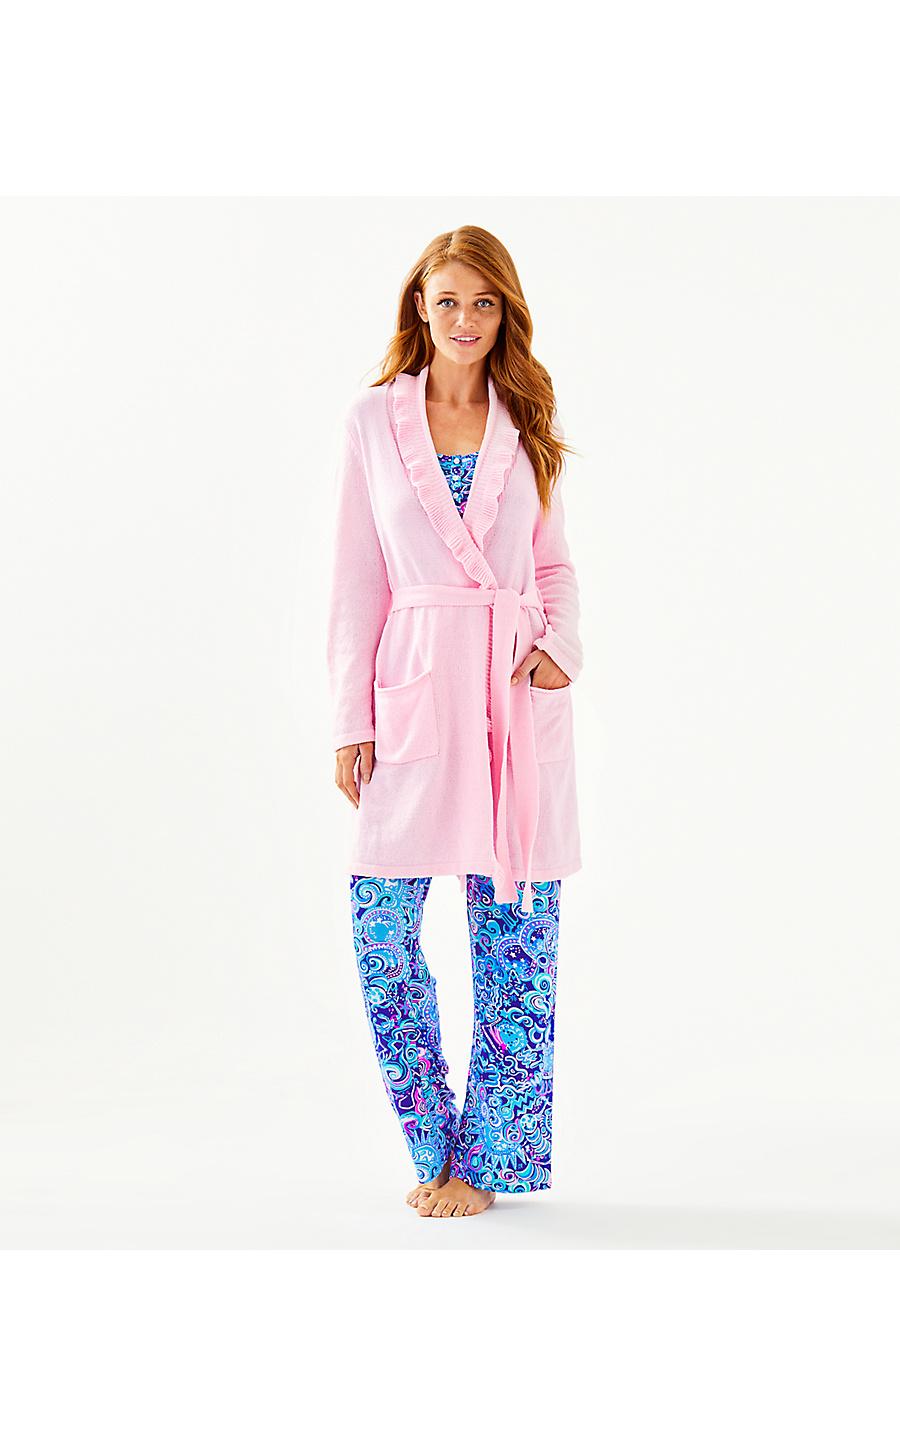 Melville Ruffle Robe